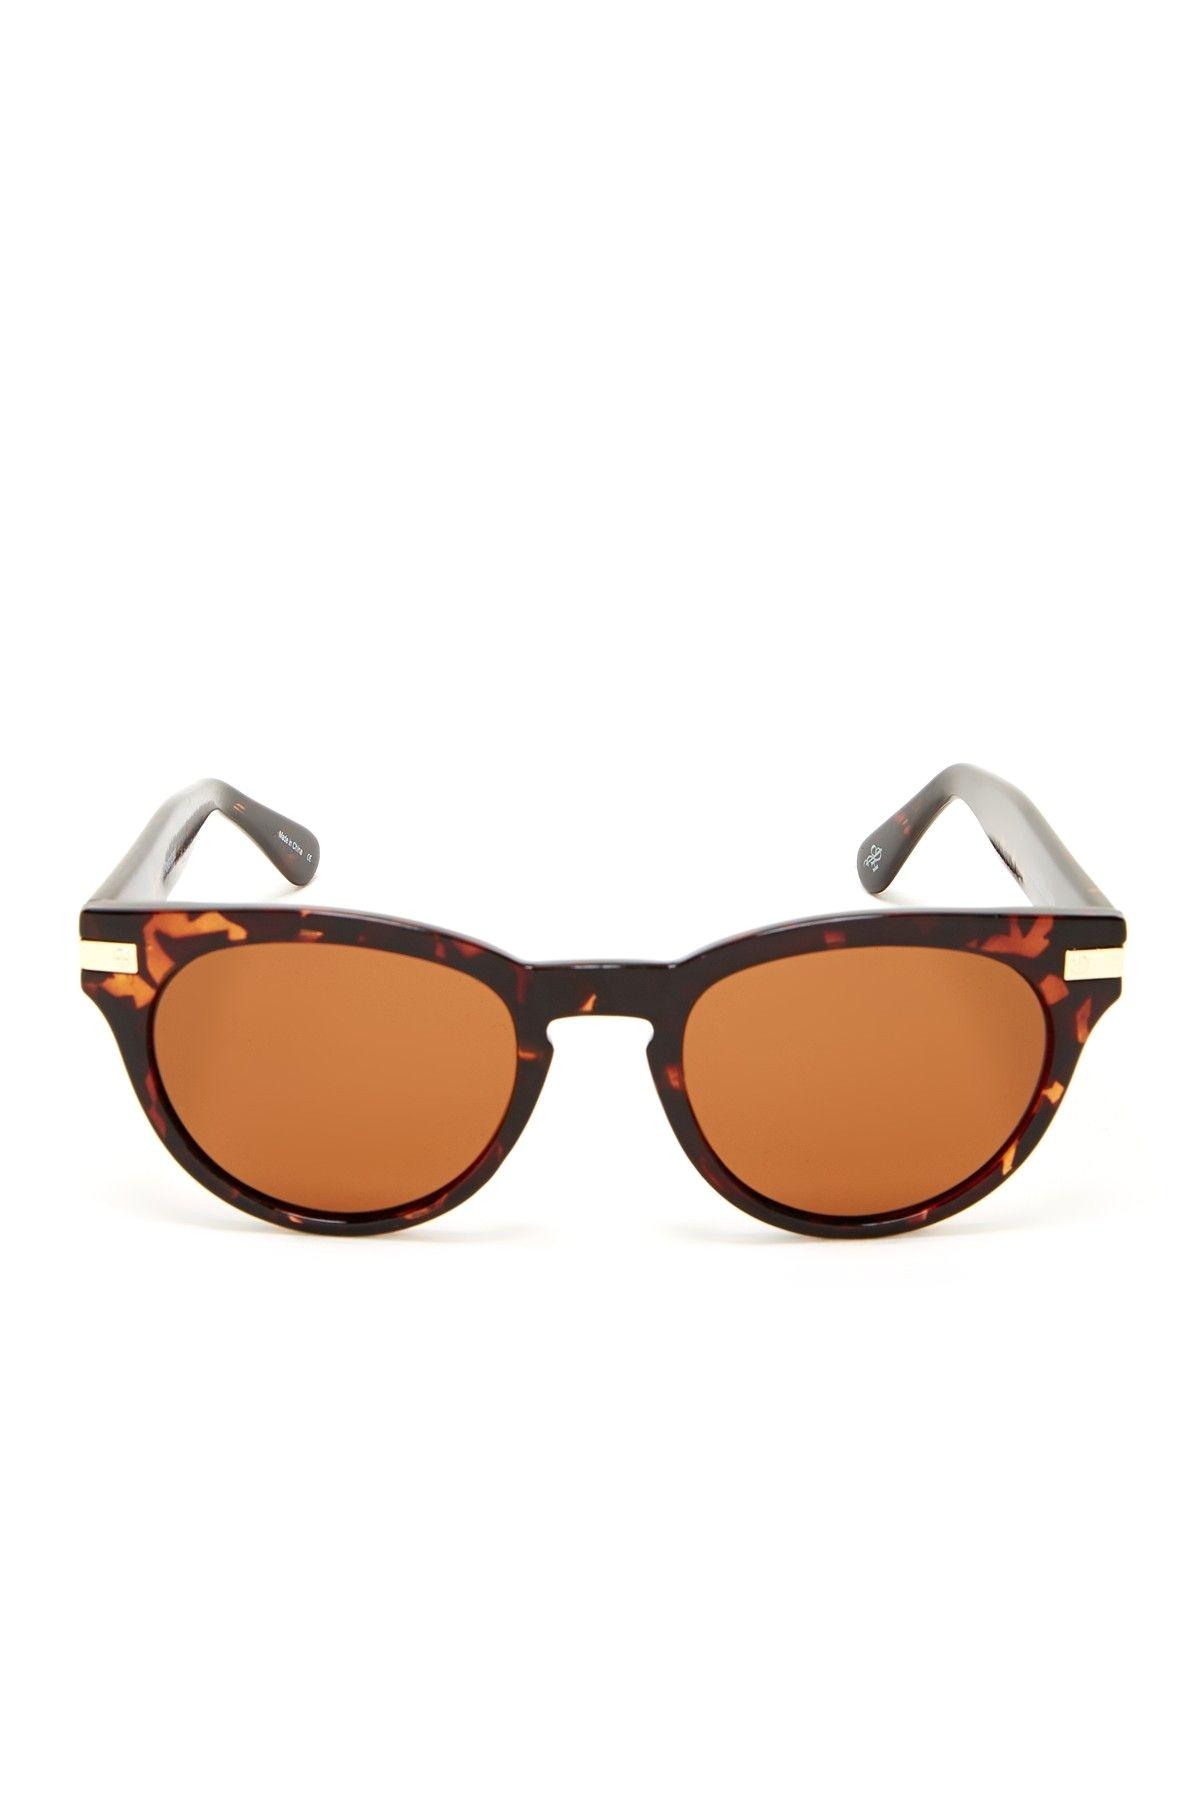 Cole Haan Sunglasses nordstrom Rack Women S P3 Sunglasses by Cole Haan On Hautelook Fash Bash